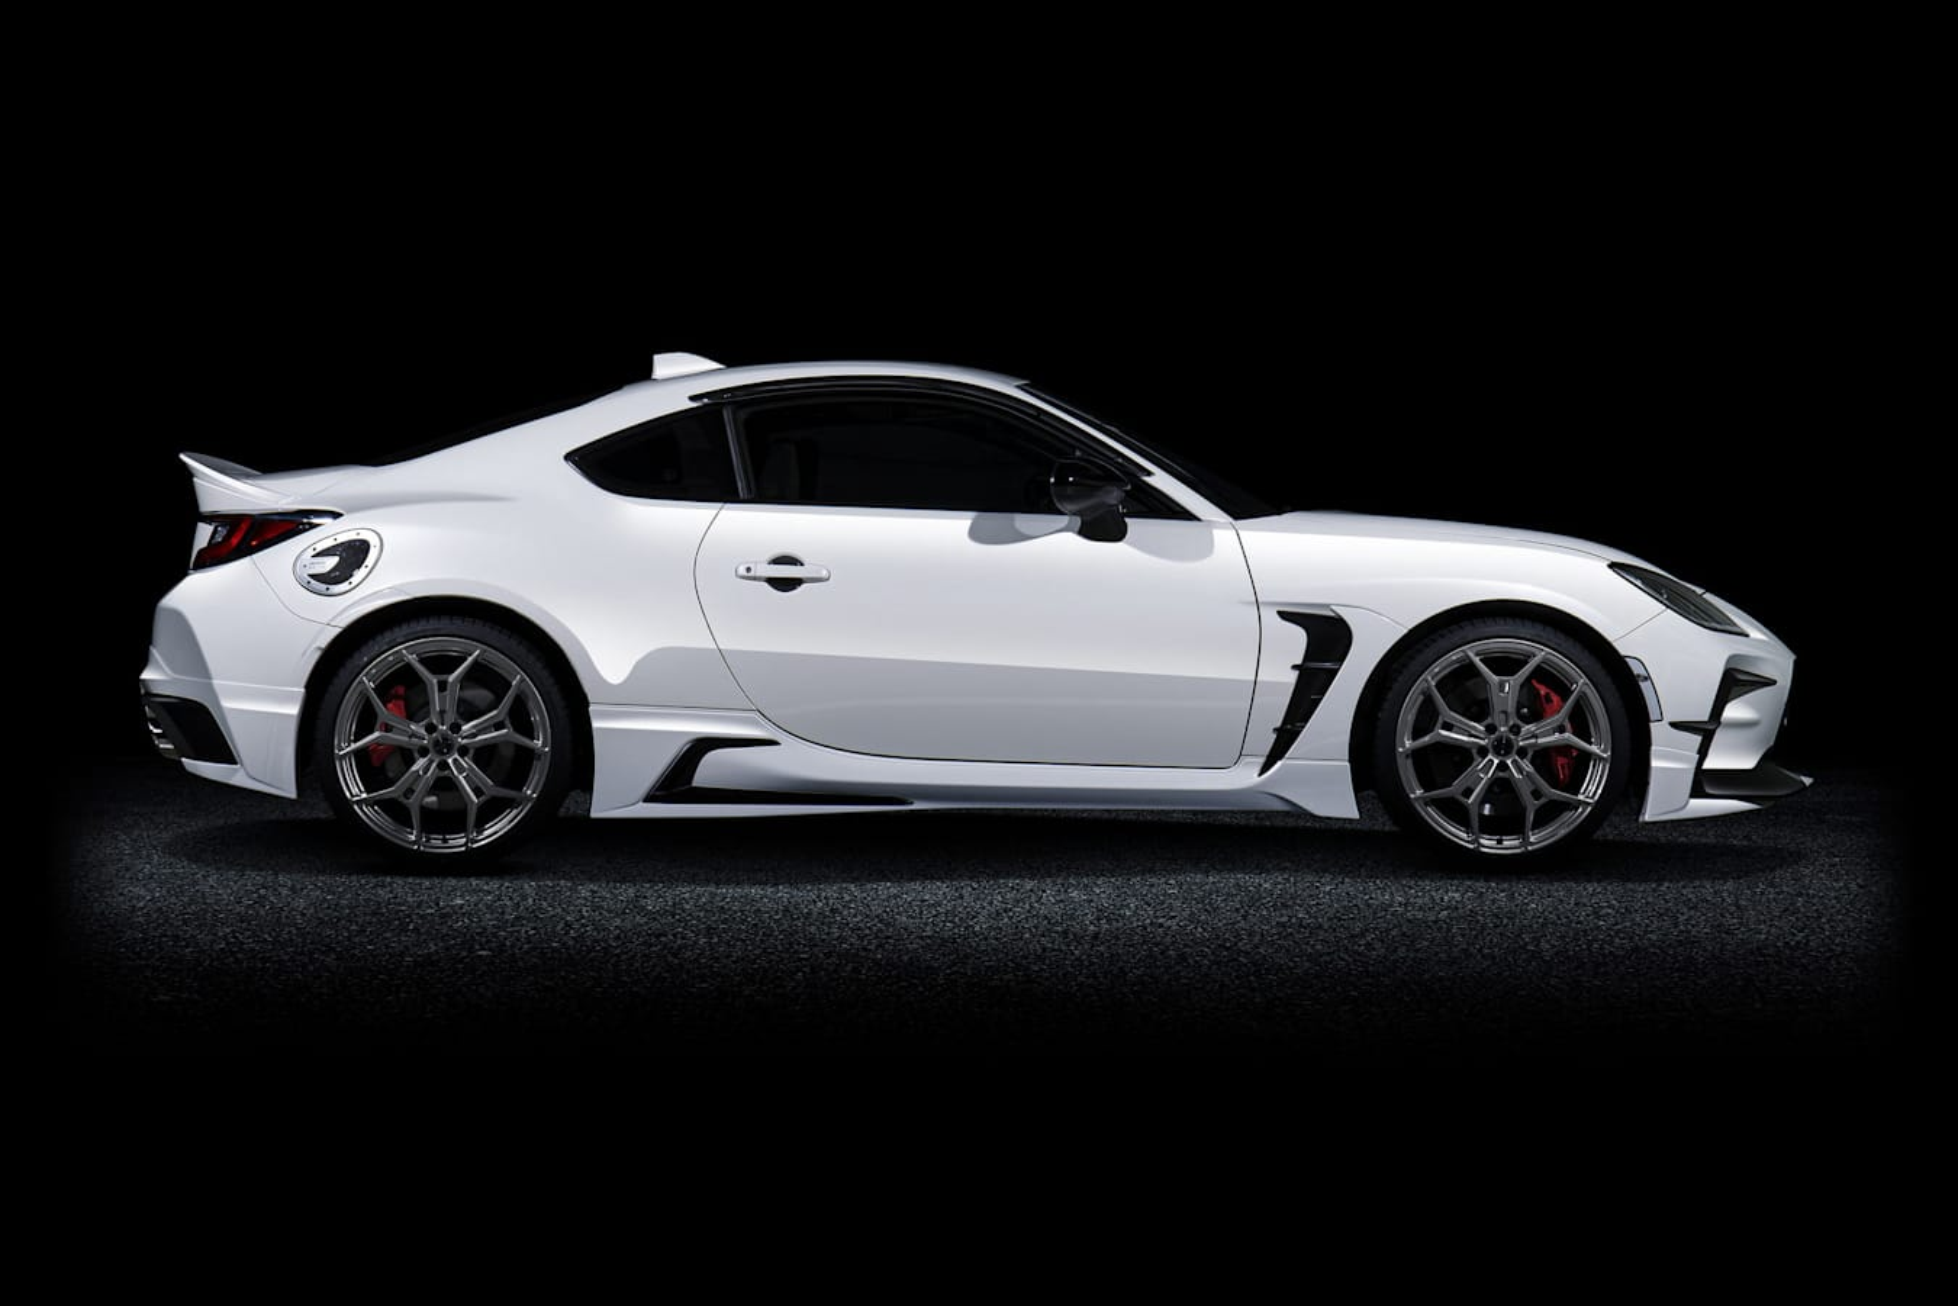 Toyota Gr 86 Gazoo Racing Concept 06